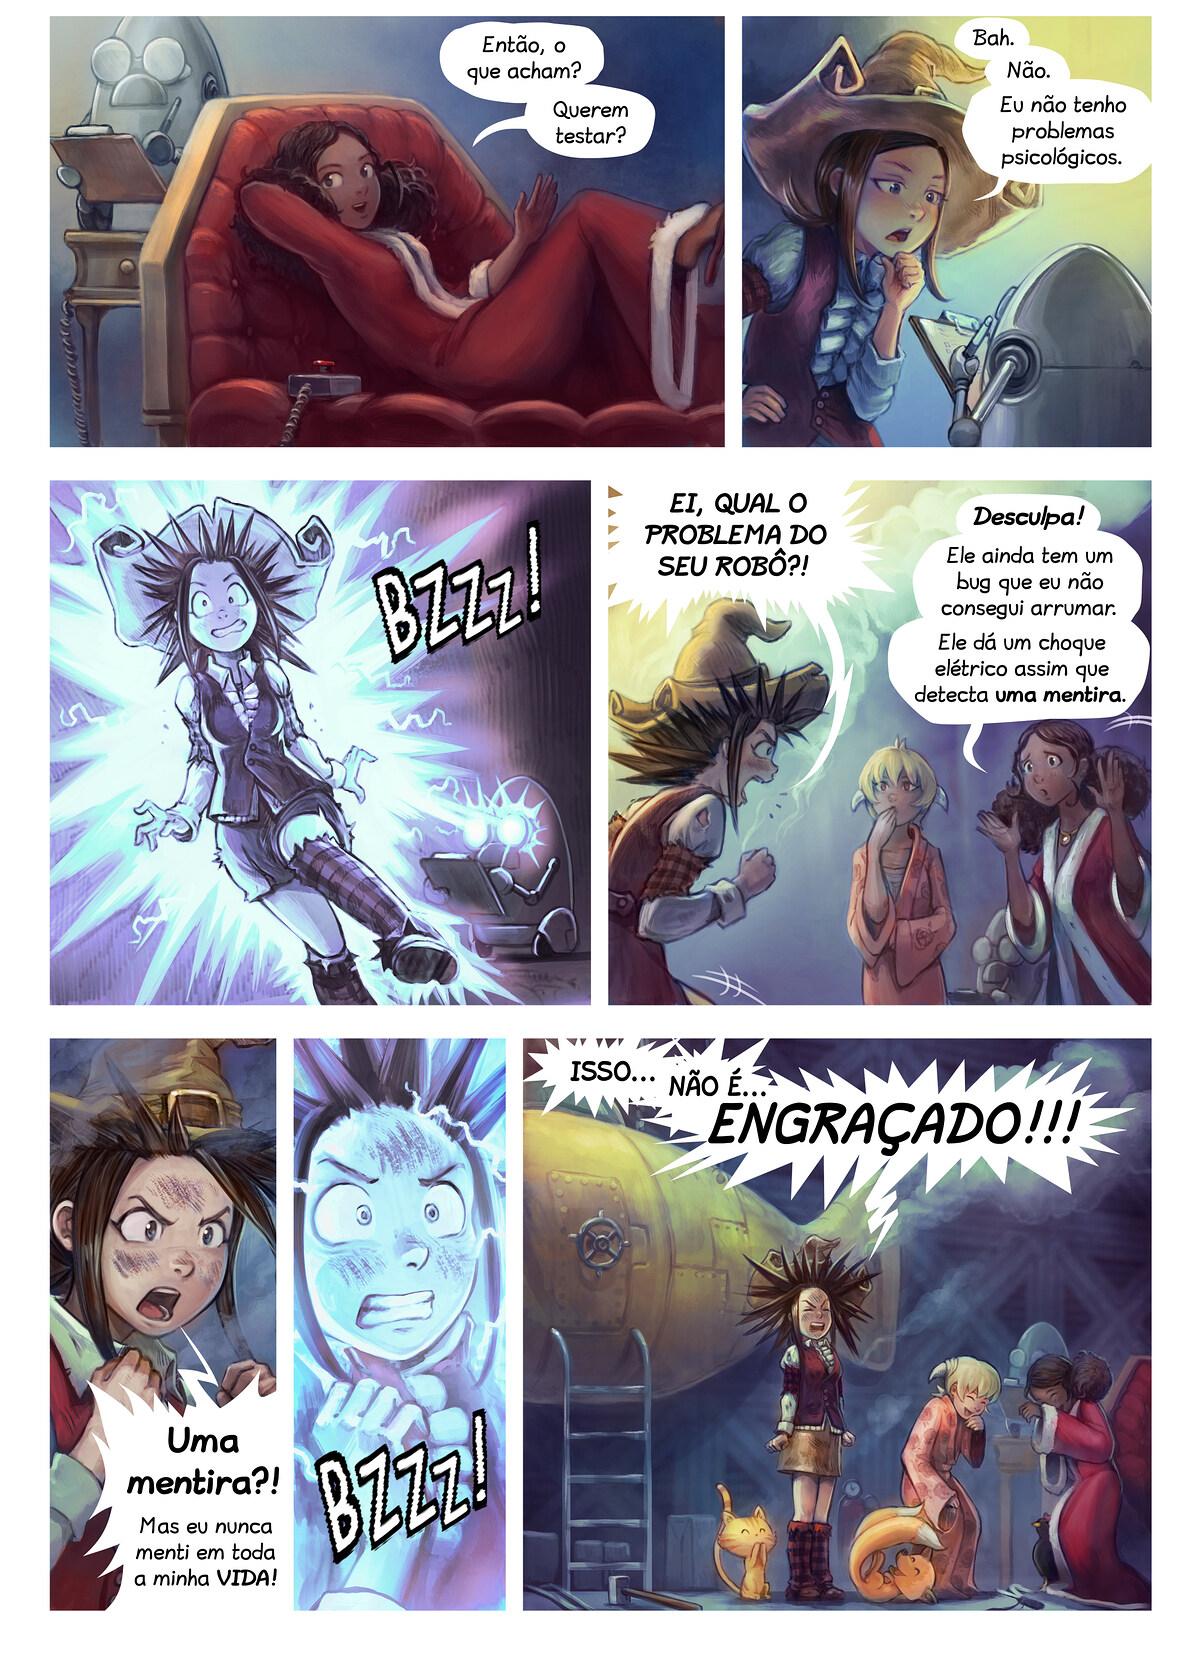 A webcomic page of Pepper&Carrot, episódio 27 [pt], página 4